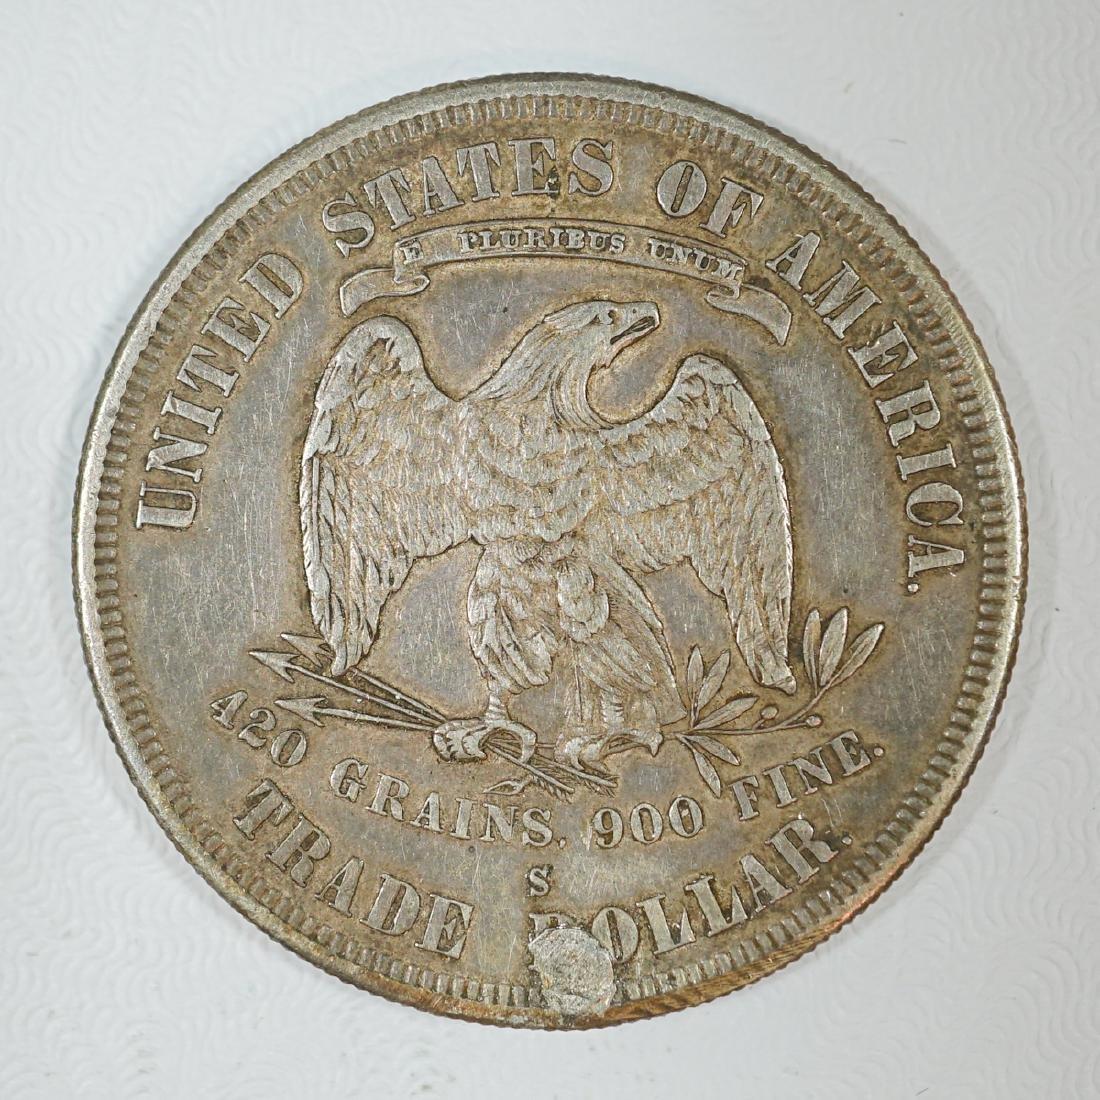 1877-S U.S. Silver Trade Dollar - 2